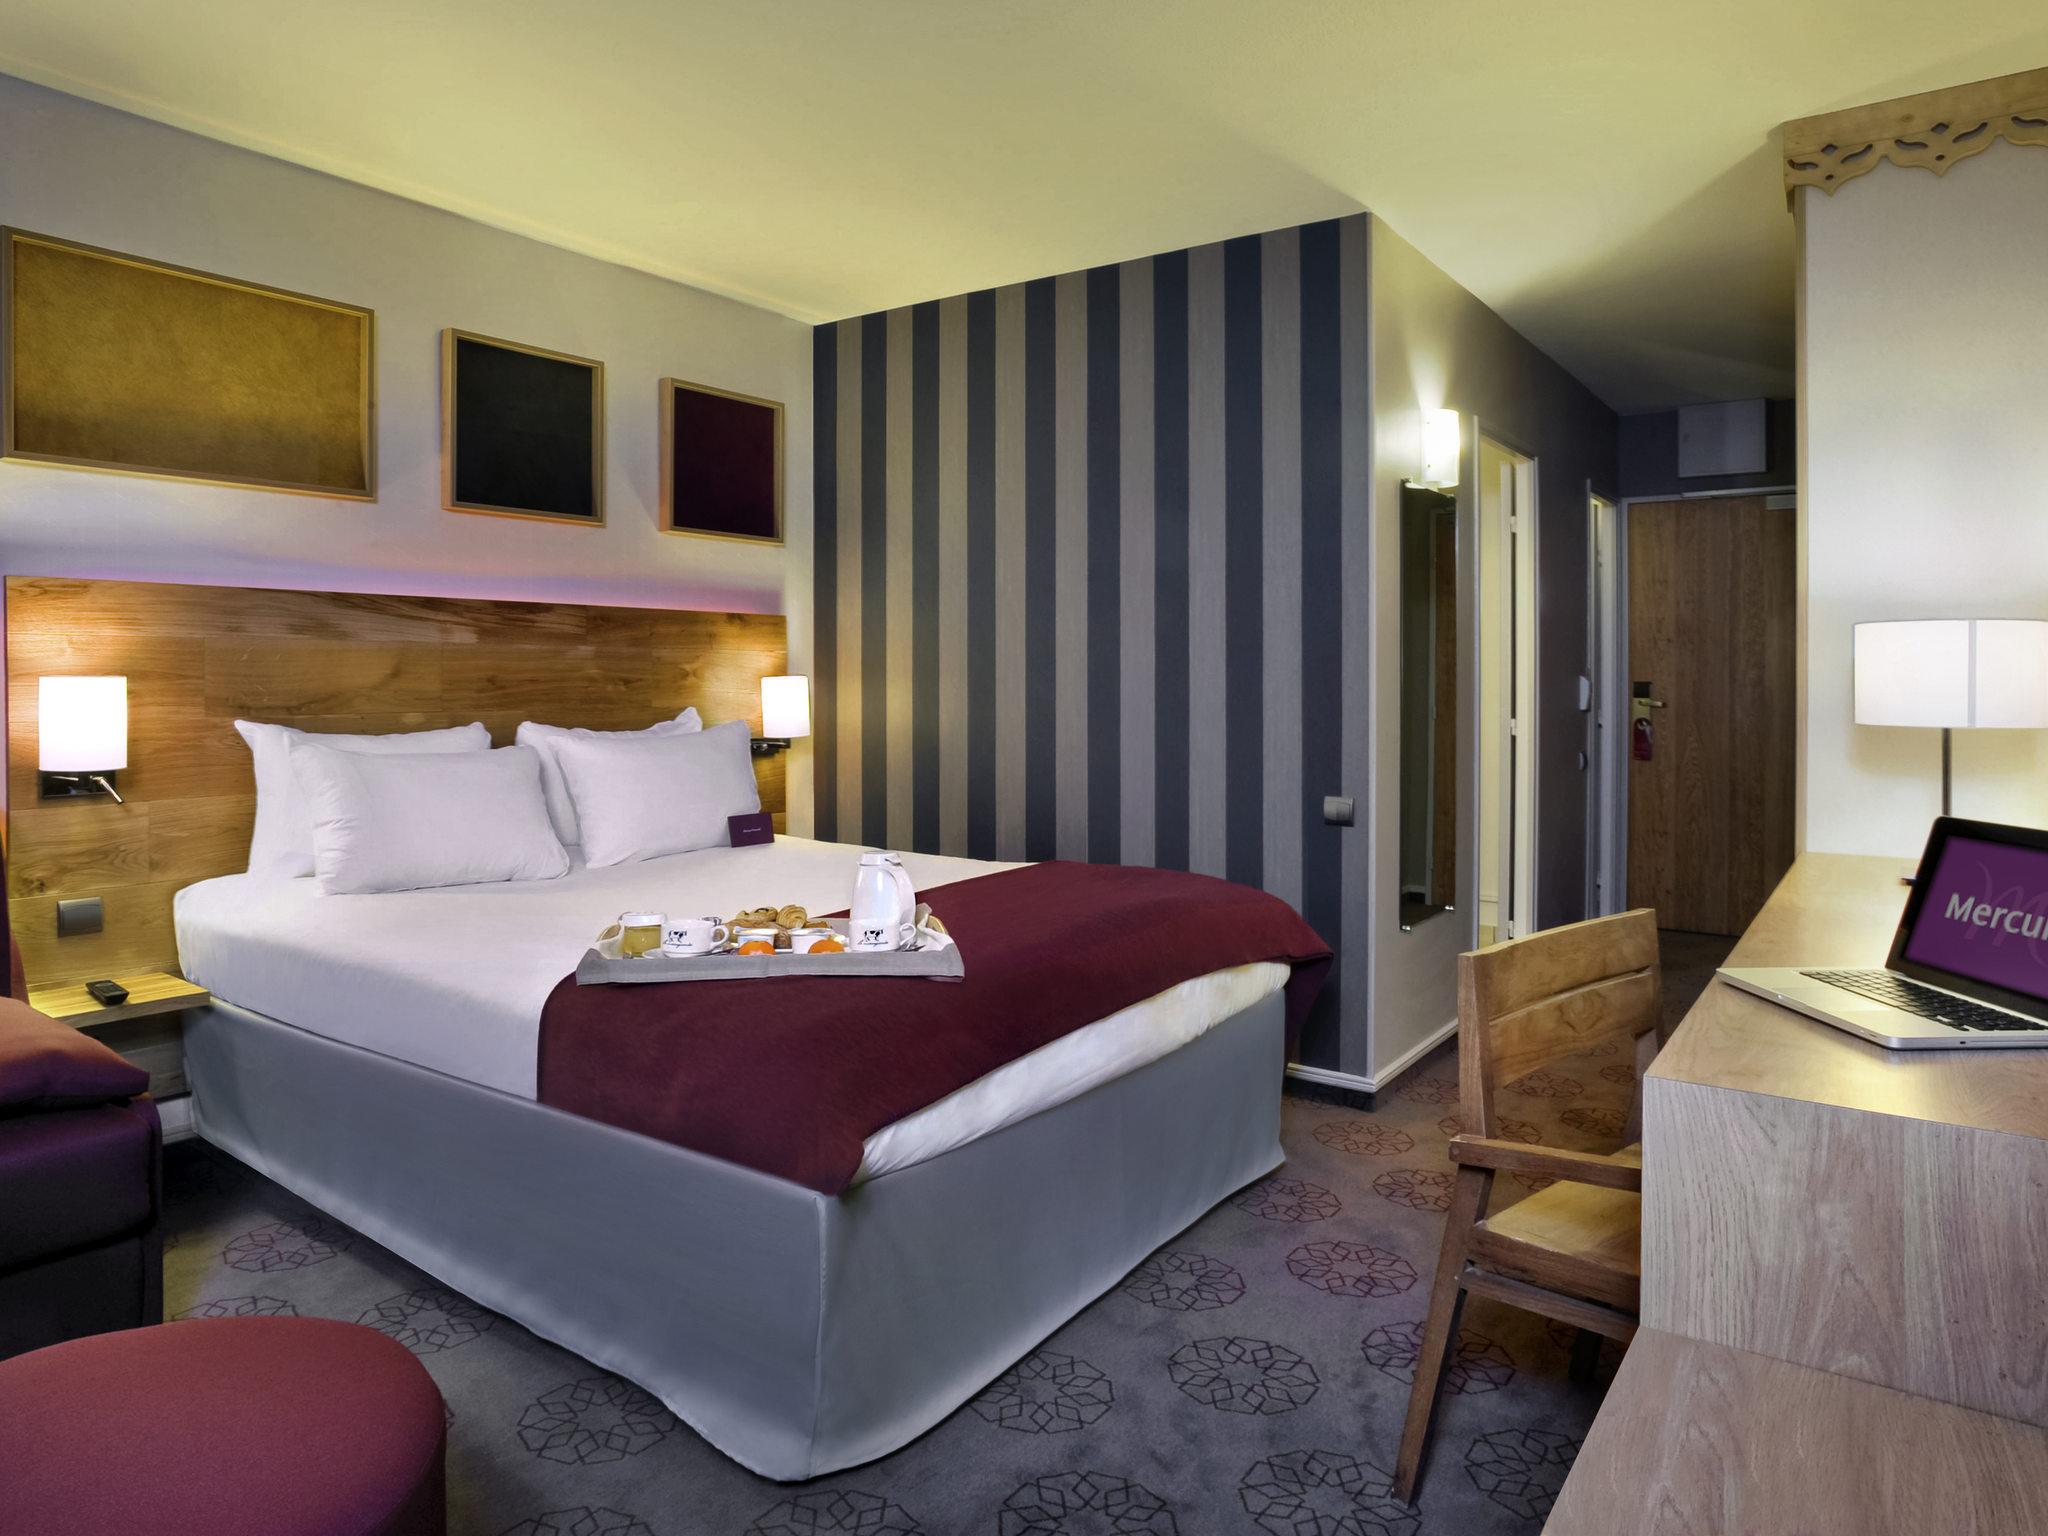 Hotel – Hôtel Mercure Saint-Lary Sensoria